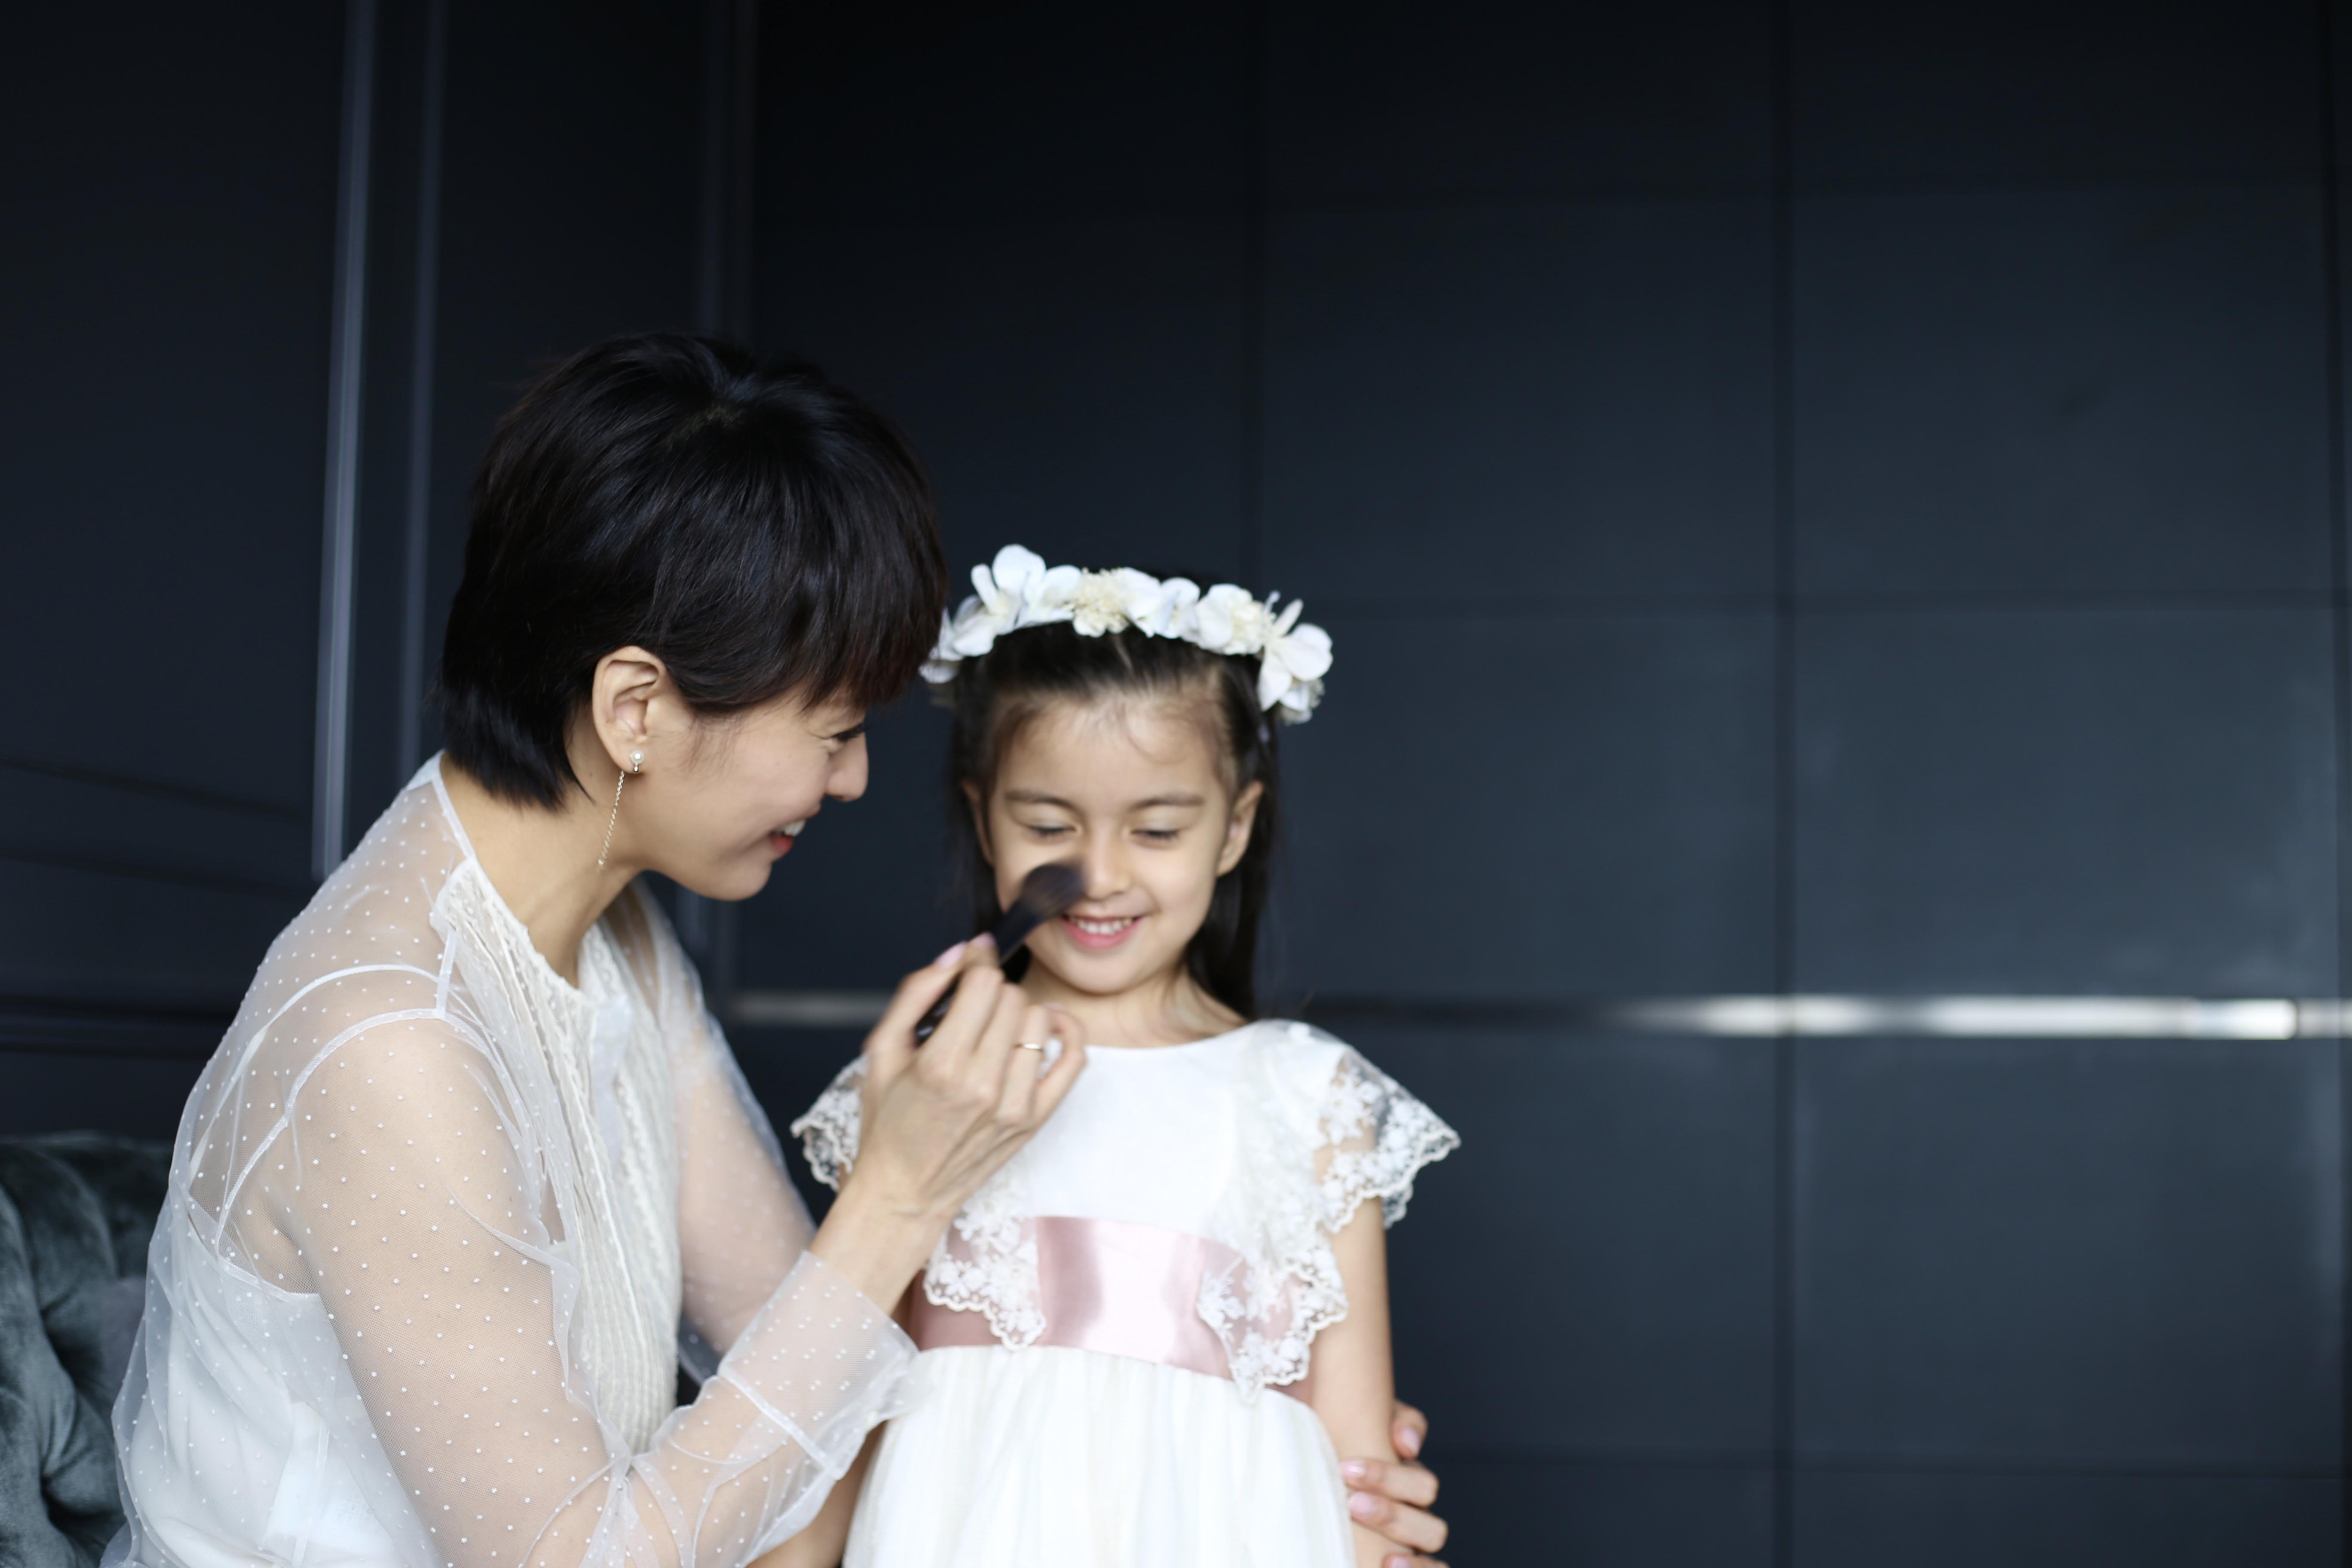 Sofia喜歡扮靚,看到Gigi補妝她又要掃兩掃,非常可愛。